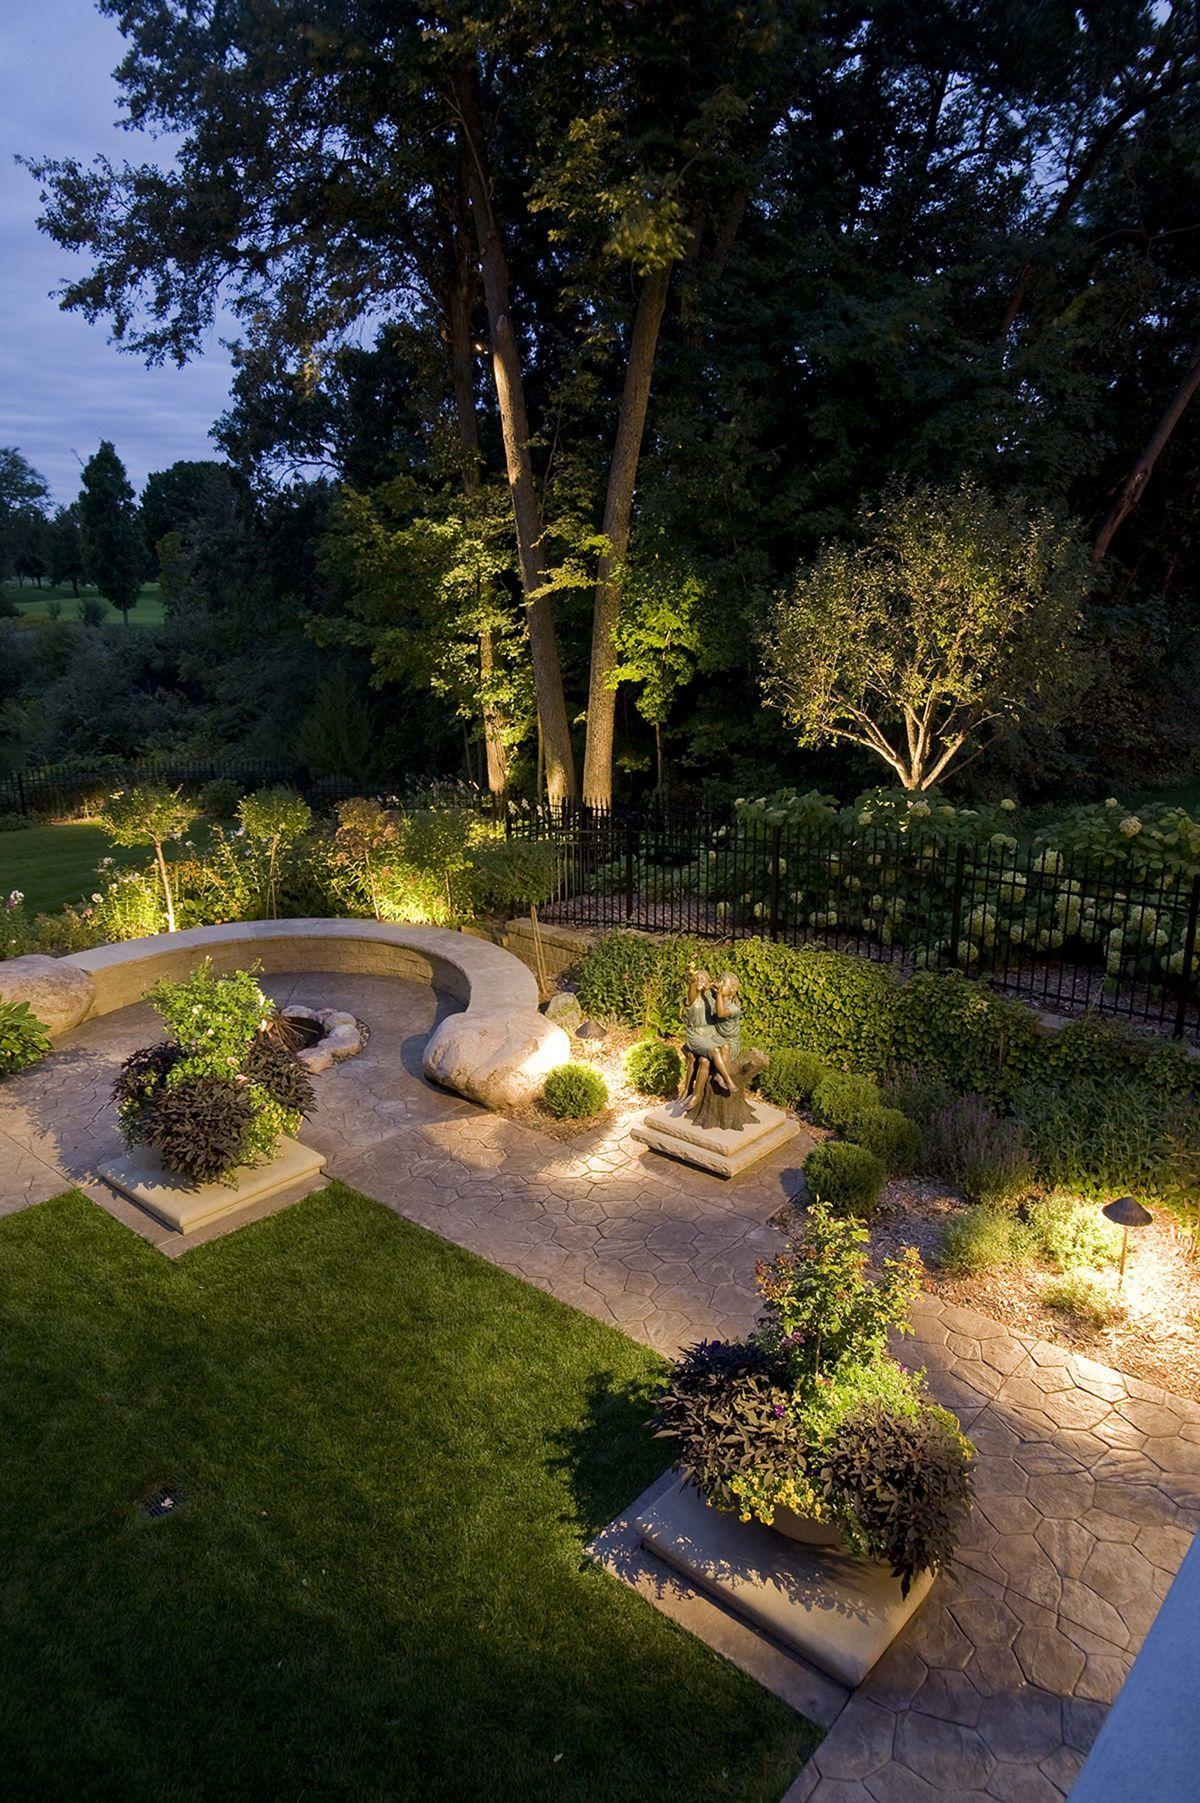 15 Most Beautiful Backyard Garden Decoration With Stunning Lighting Ideas Outdoor Landscape Lighting Outdoor Landscaping Landscape Lighting Design